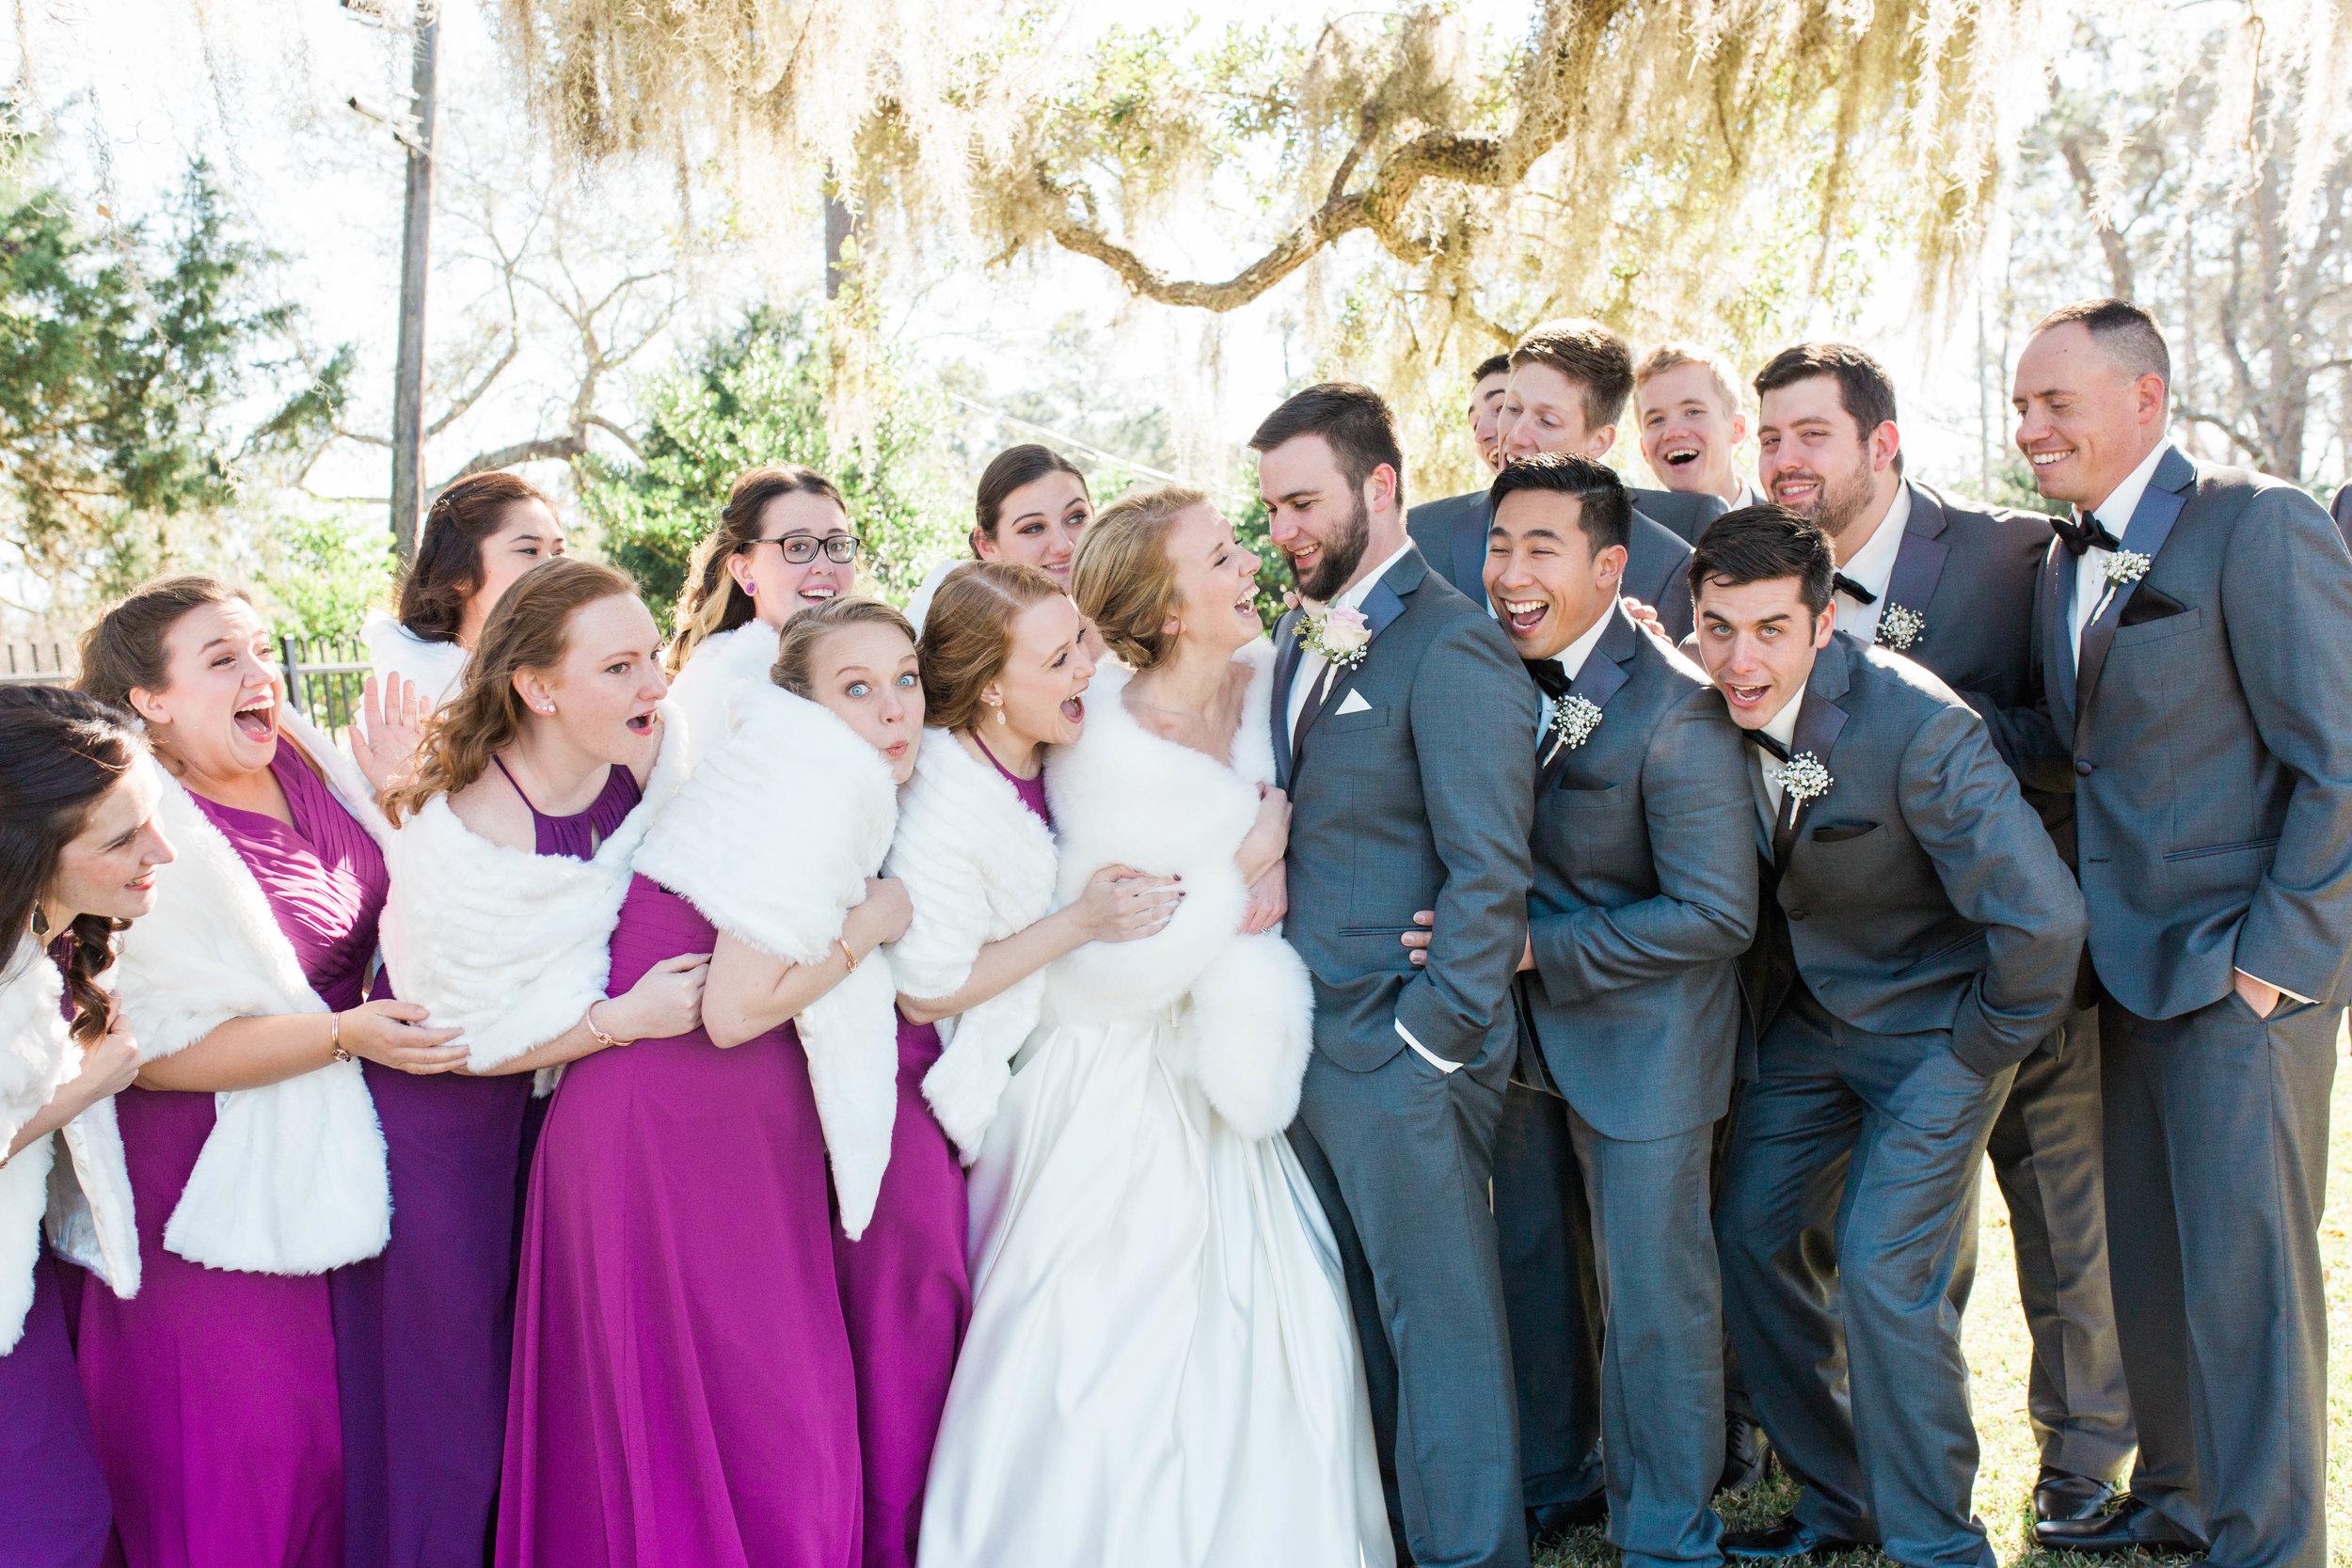 Beaumont Texas Country Club wedding-5550.jpg